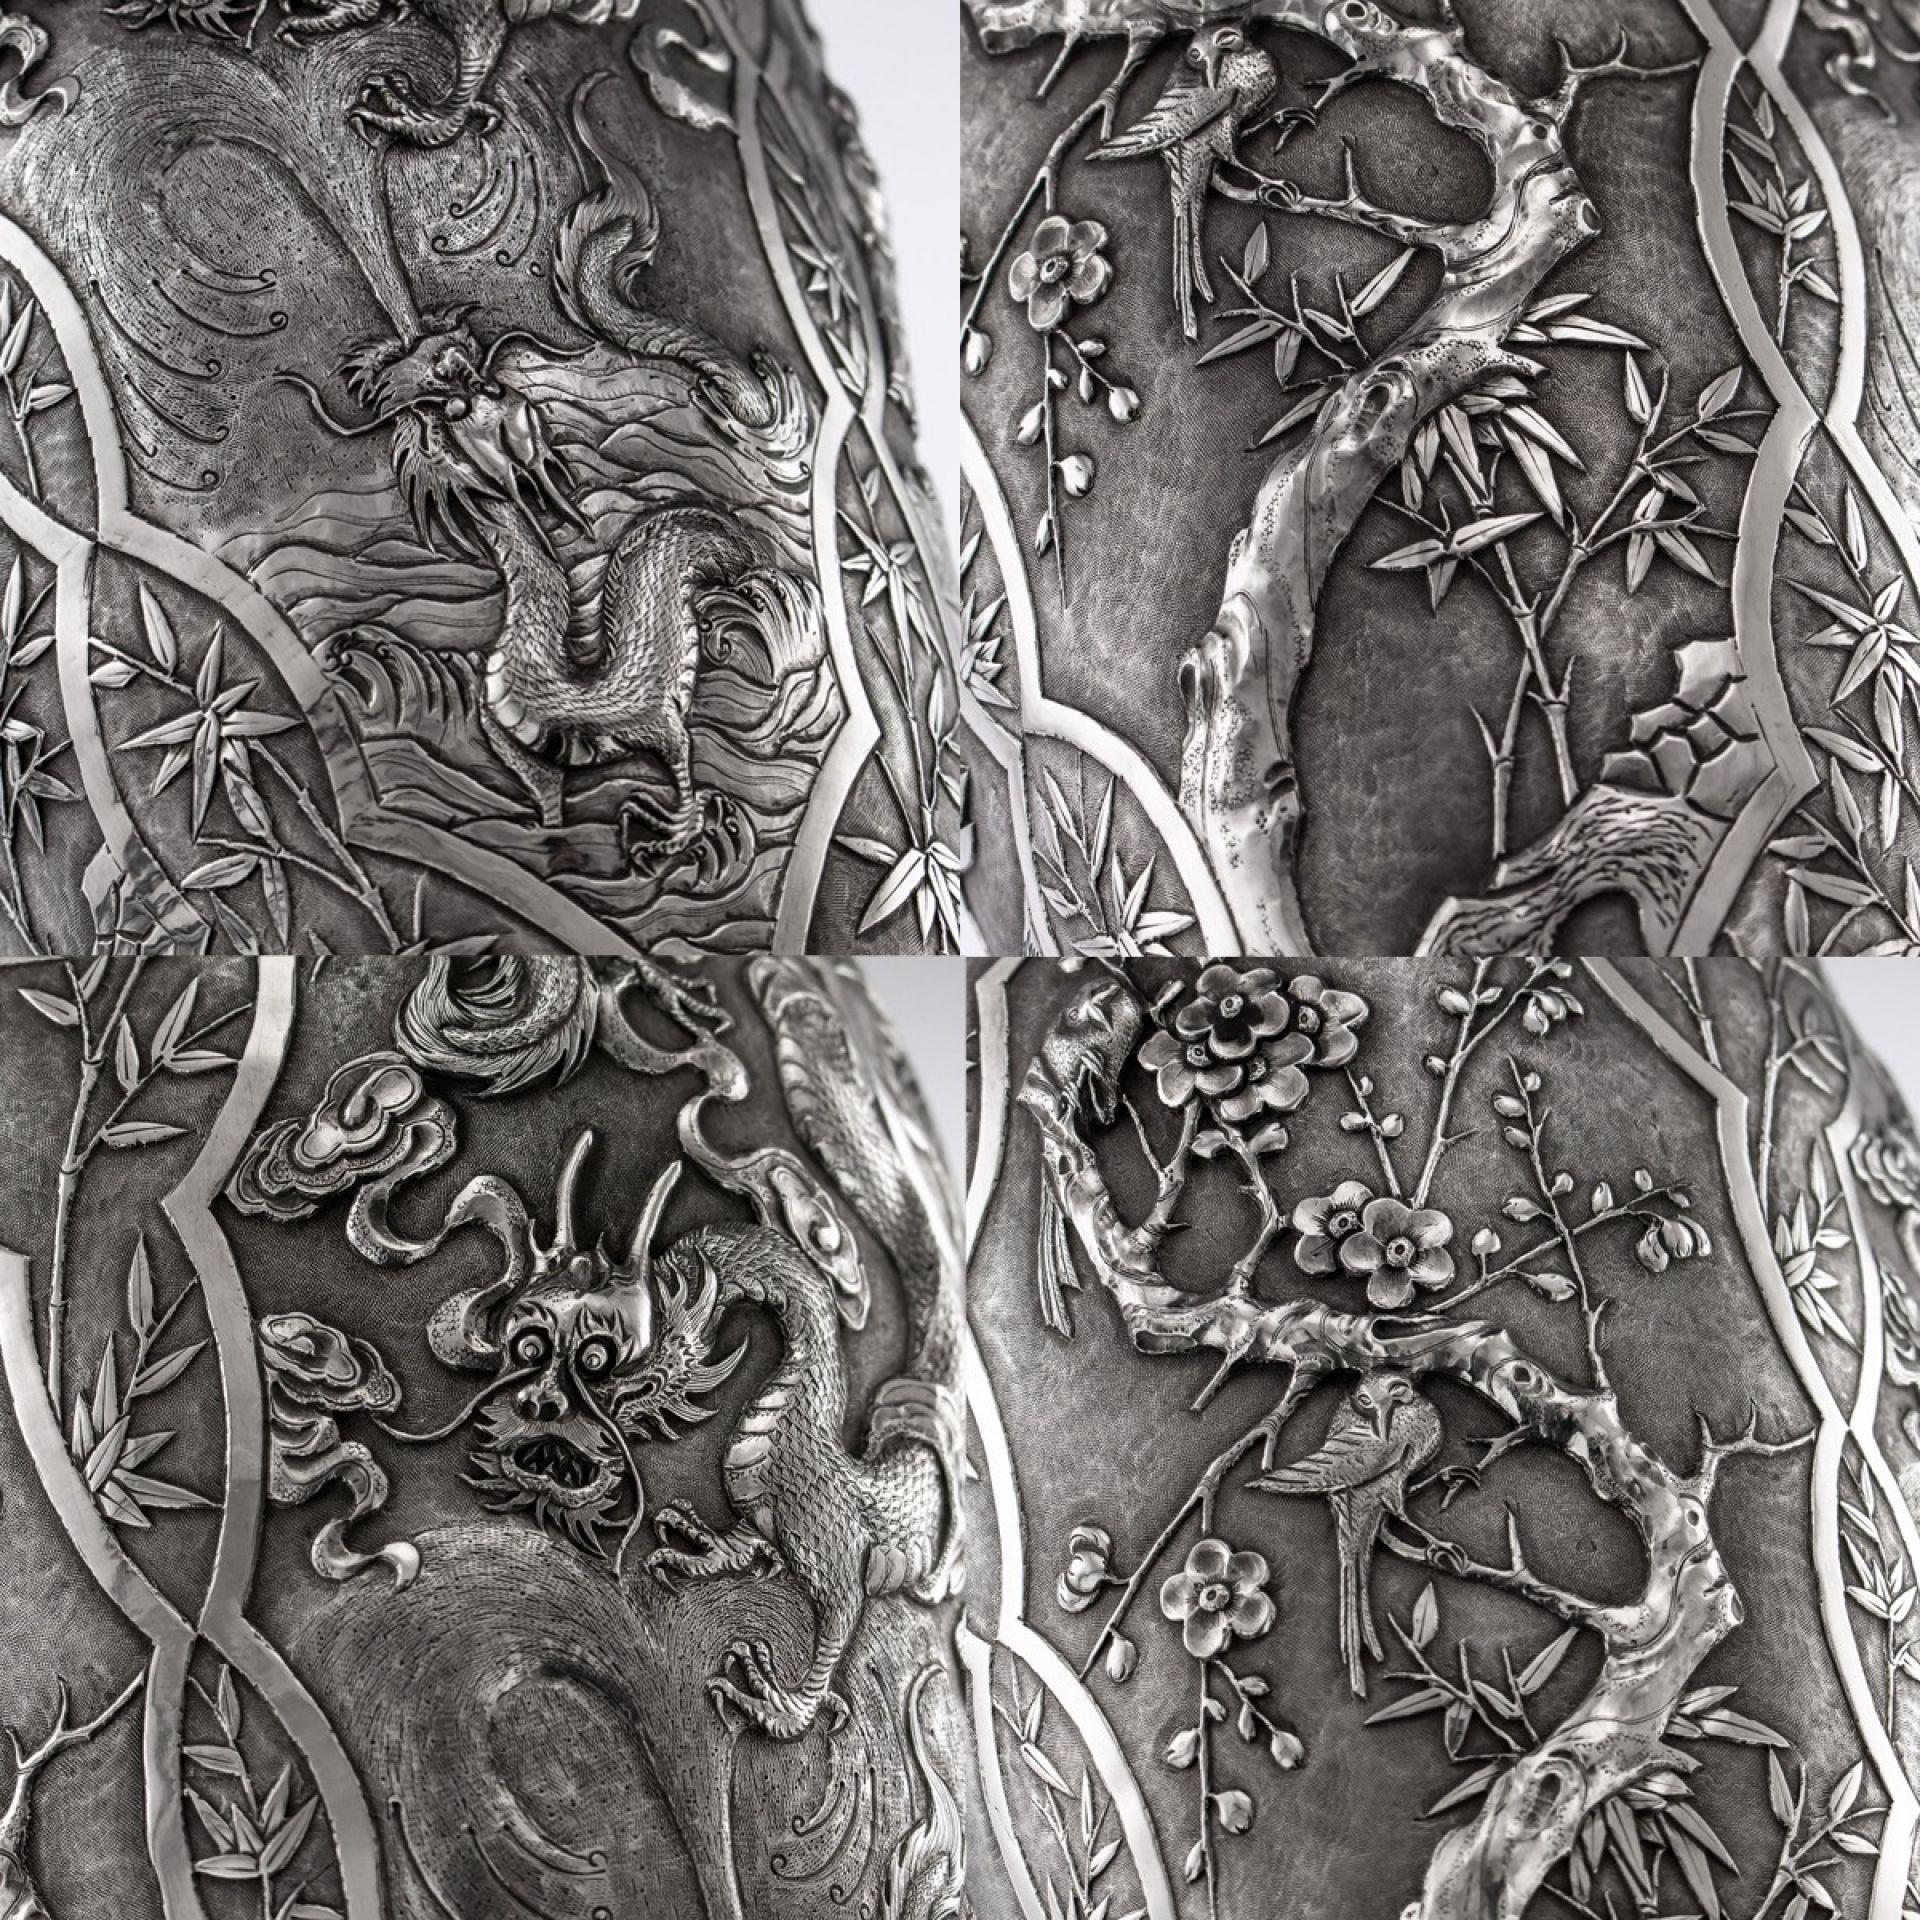 ANTIQUE 19thC CHINESE EXPORT SOLID SILVER MASSIVE VASE, CUM WO c.1890